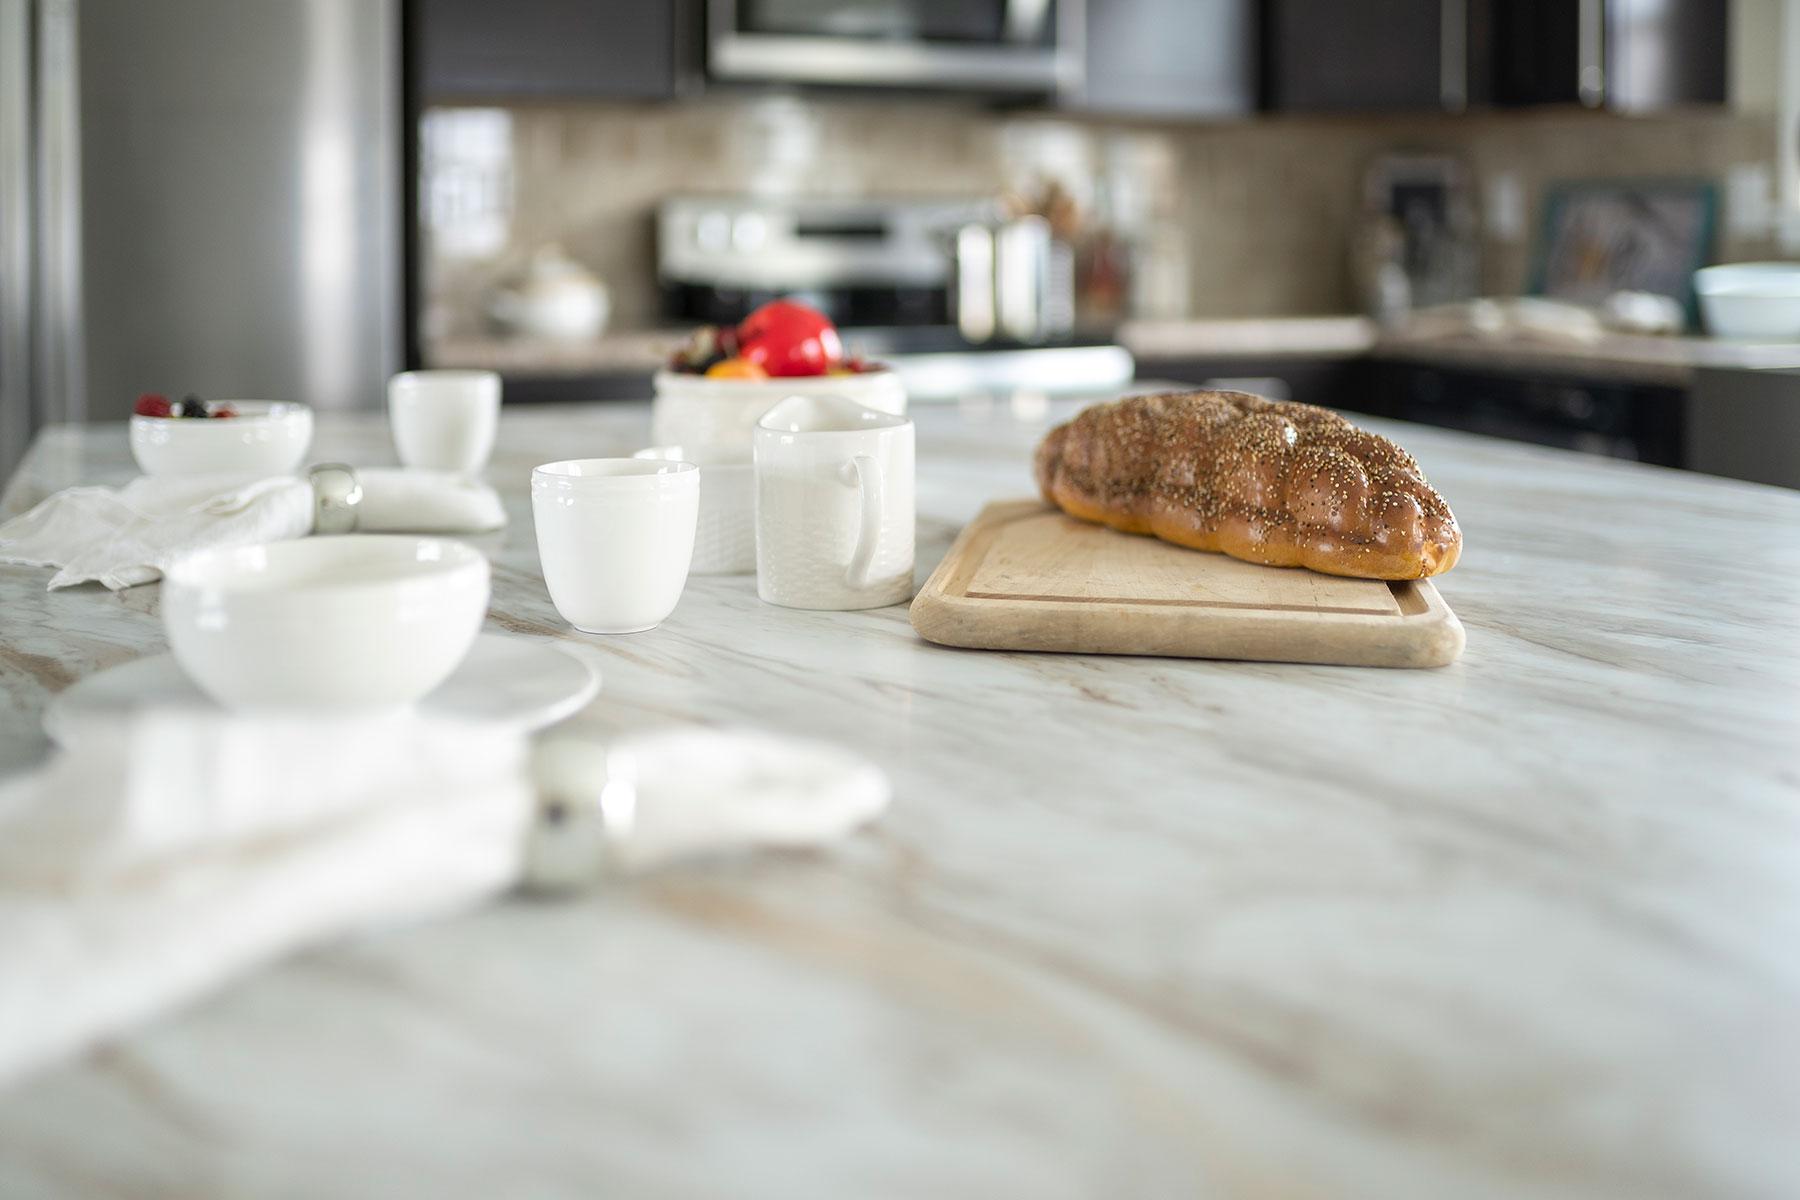 Ashley-kitchen-decor-1